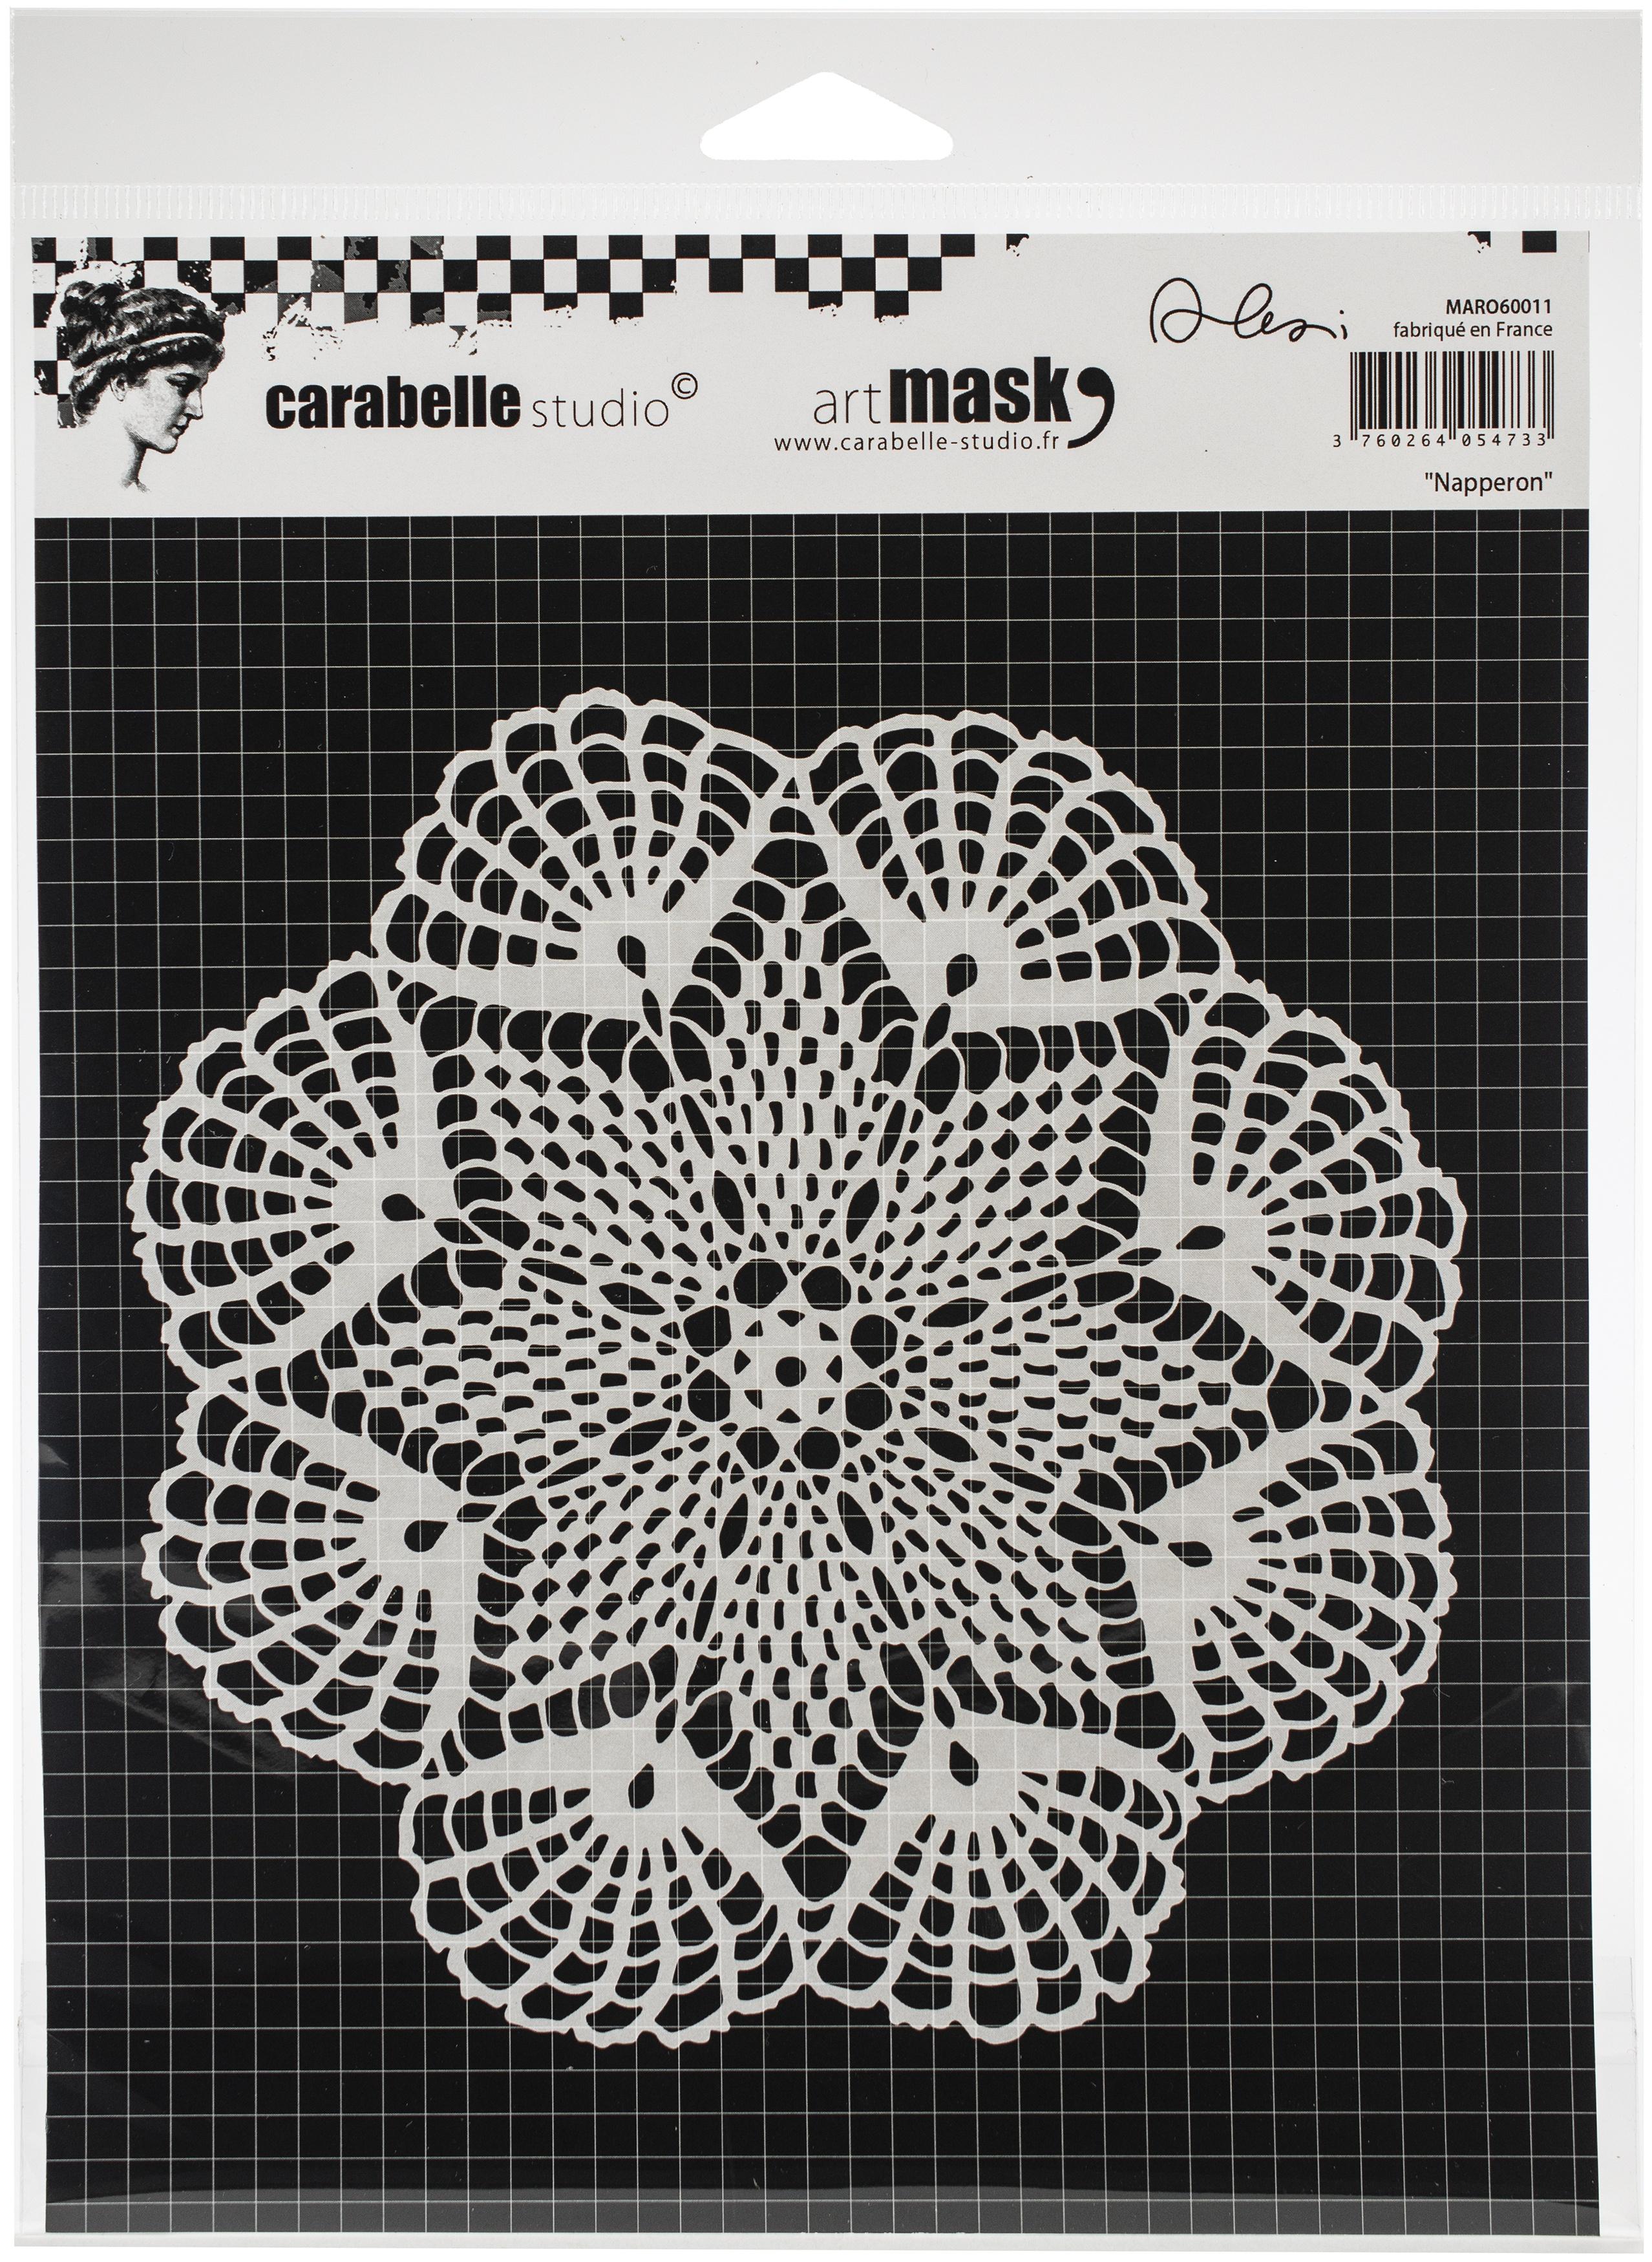 70 Carabelle Studios carabelle m/áscara de 10,5 x 14,8 cm venitien by Alexi